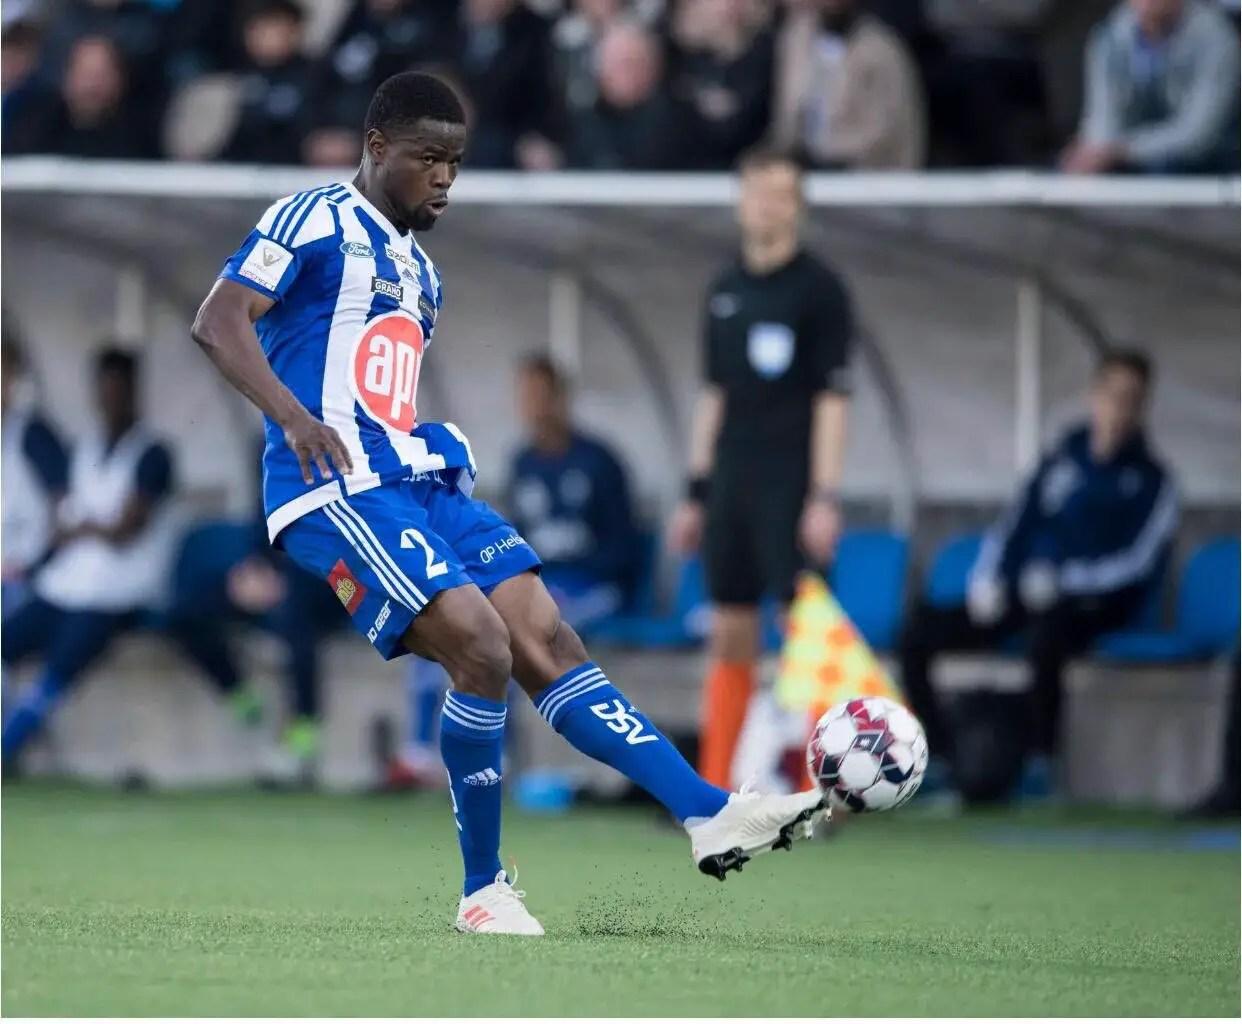 Echiejile Terminates Contract With Finnish Club HJK Helsinki